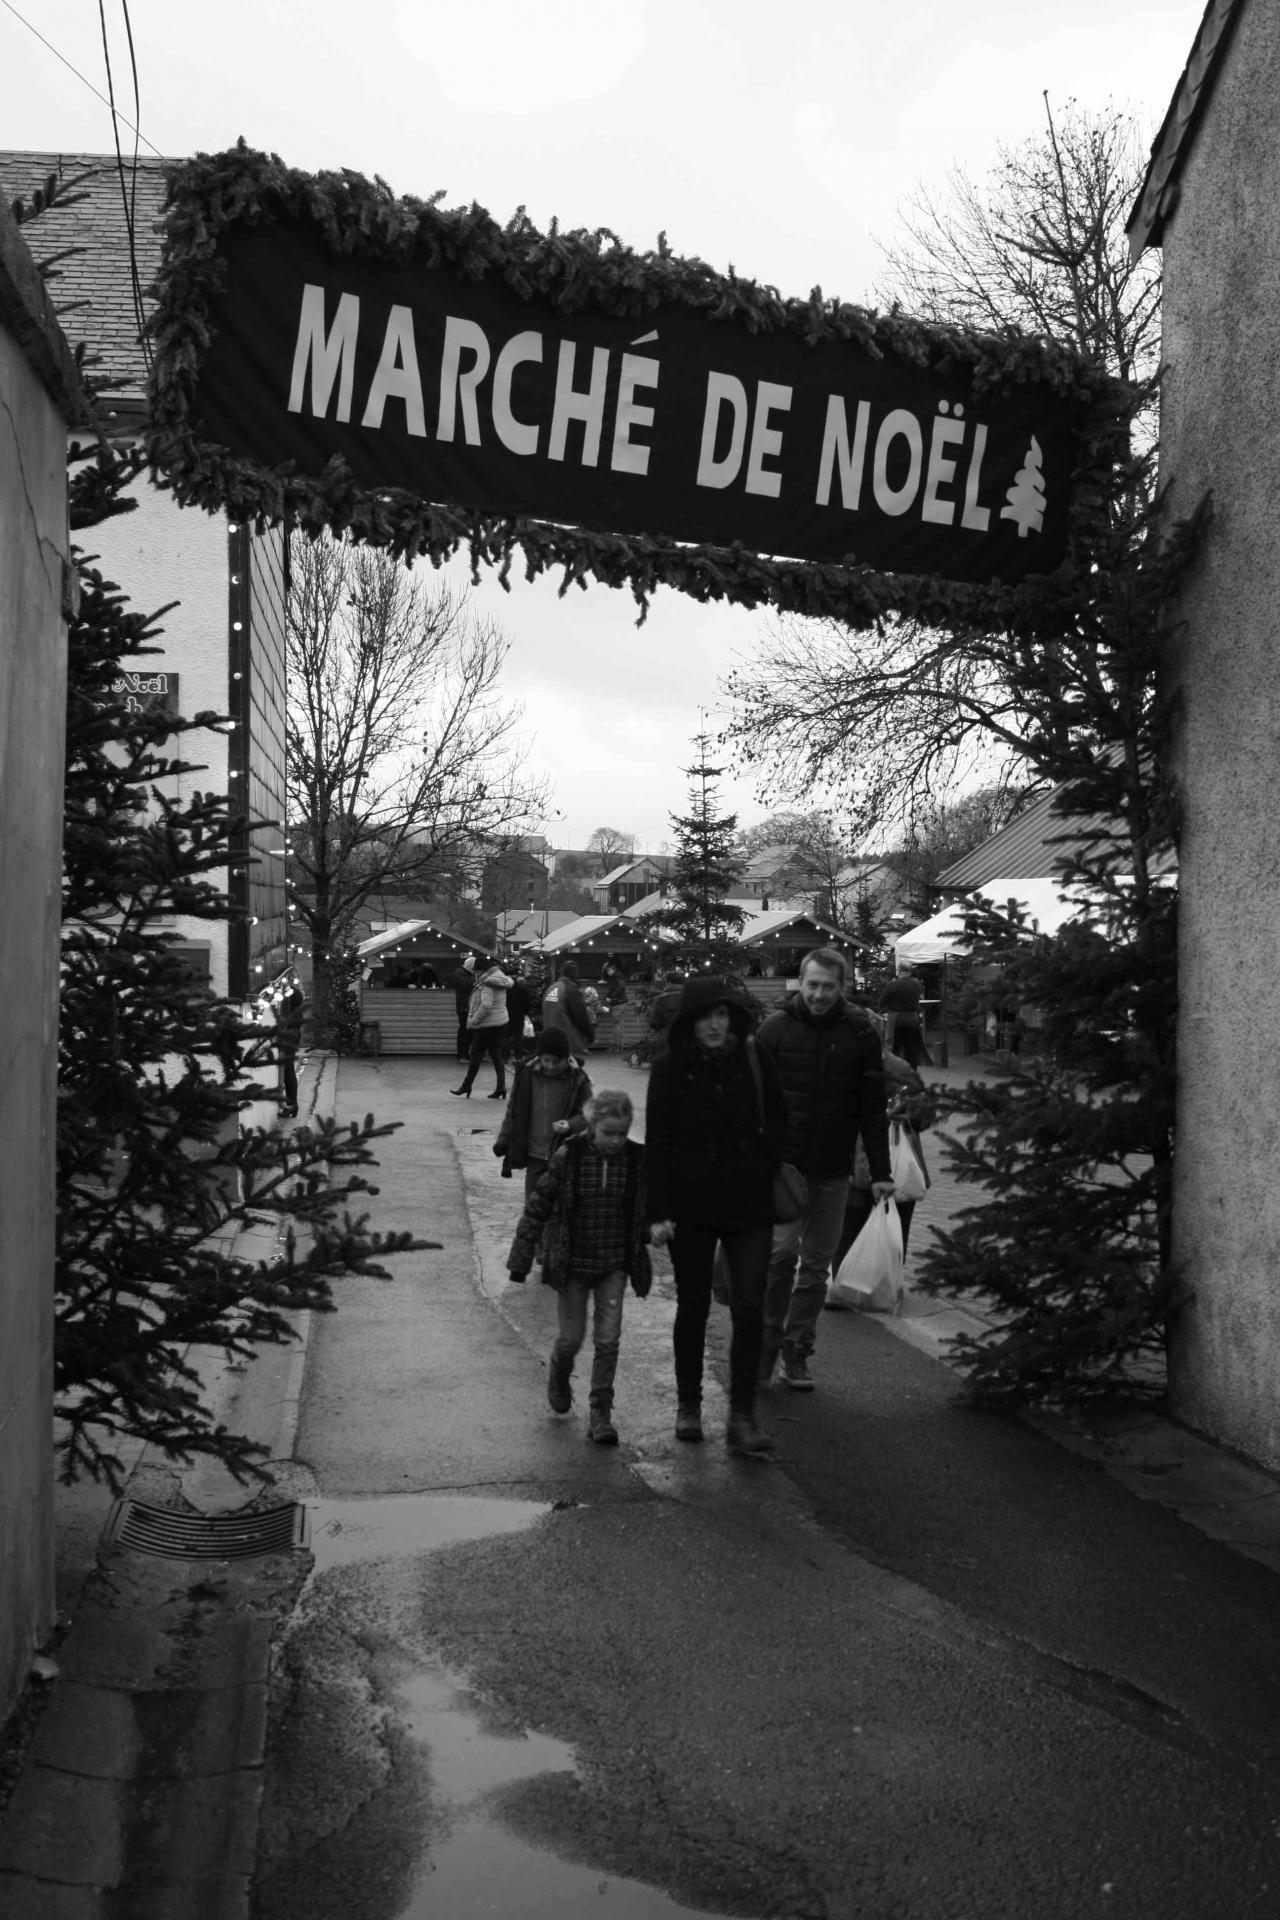 Marche noel nb